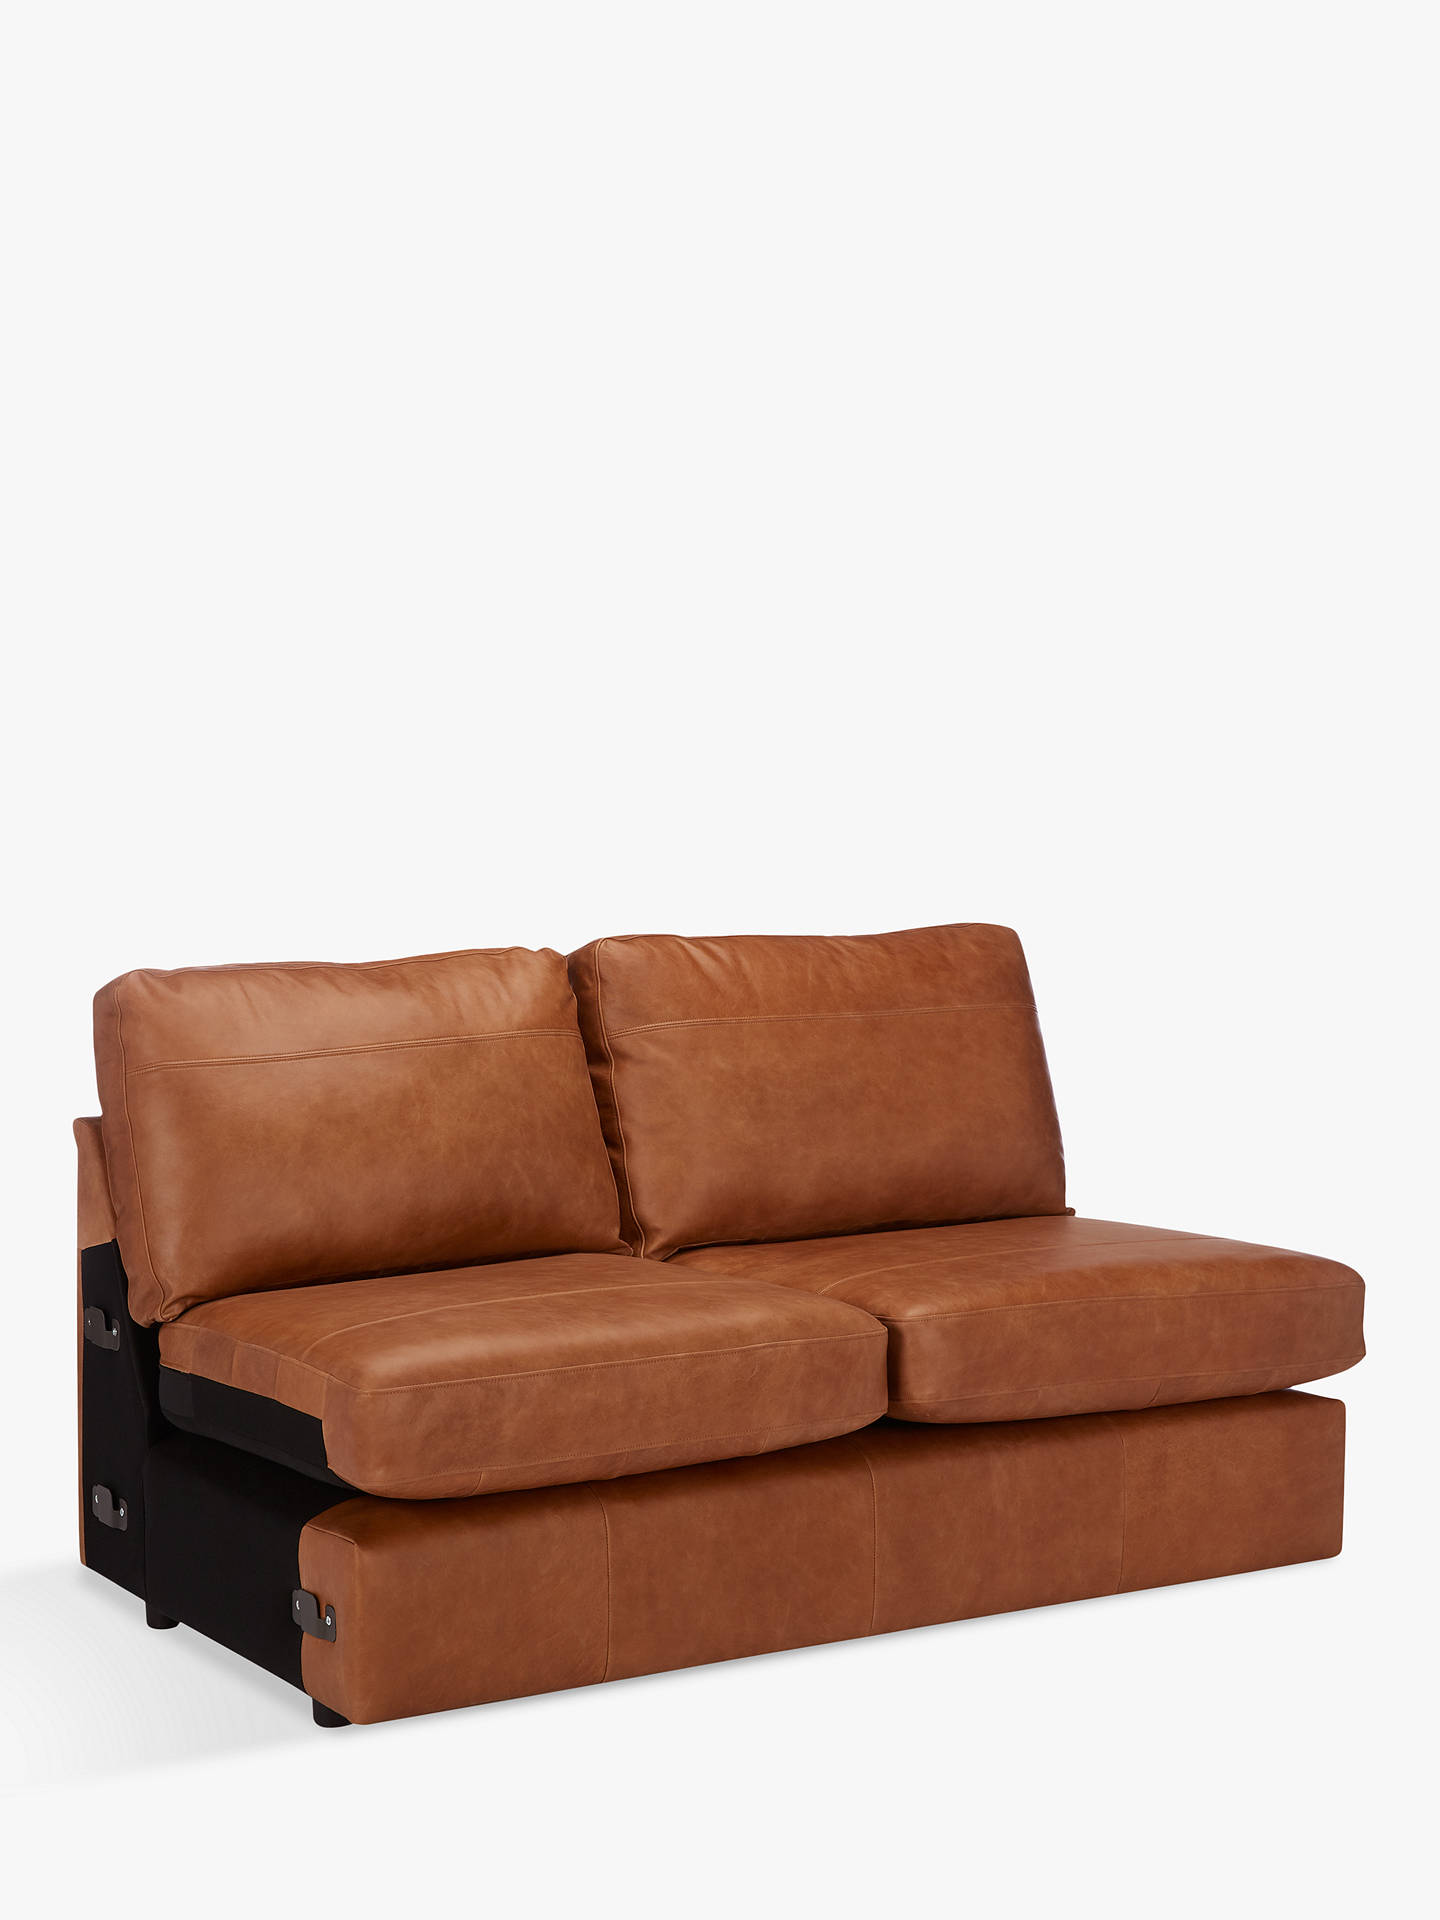 John Lewis Partners Oliver Large 3 Seater Armless Leather Sofa Dark Leg Er